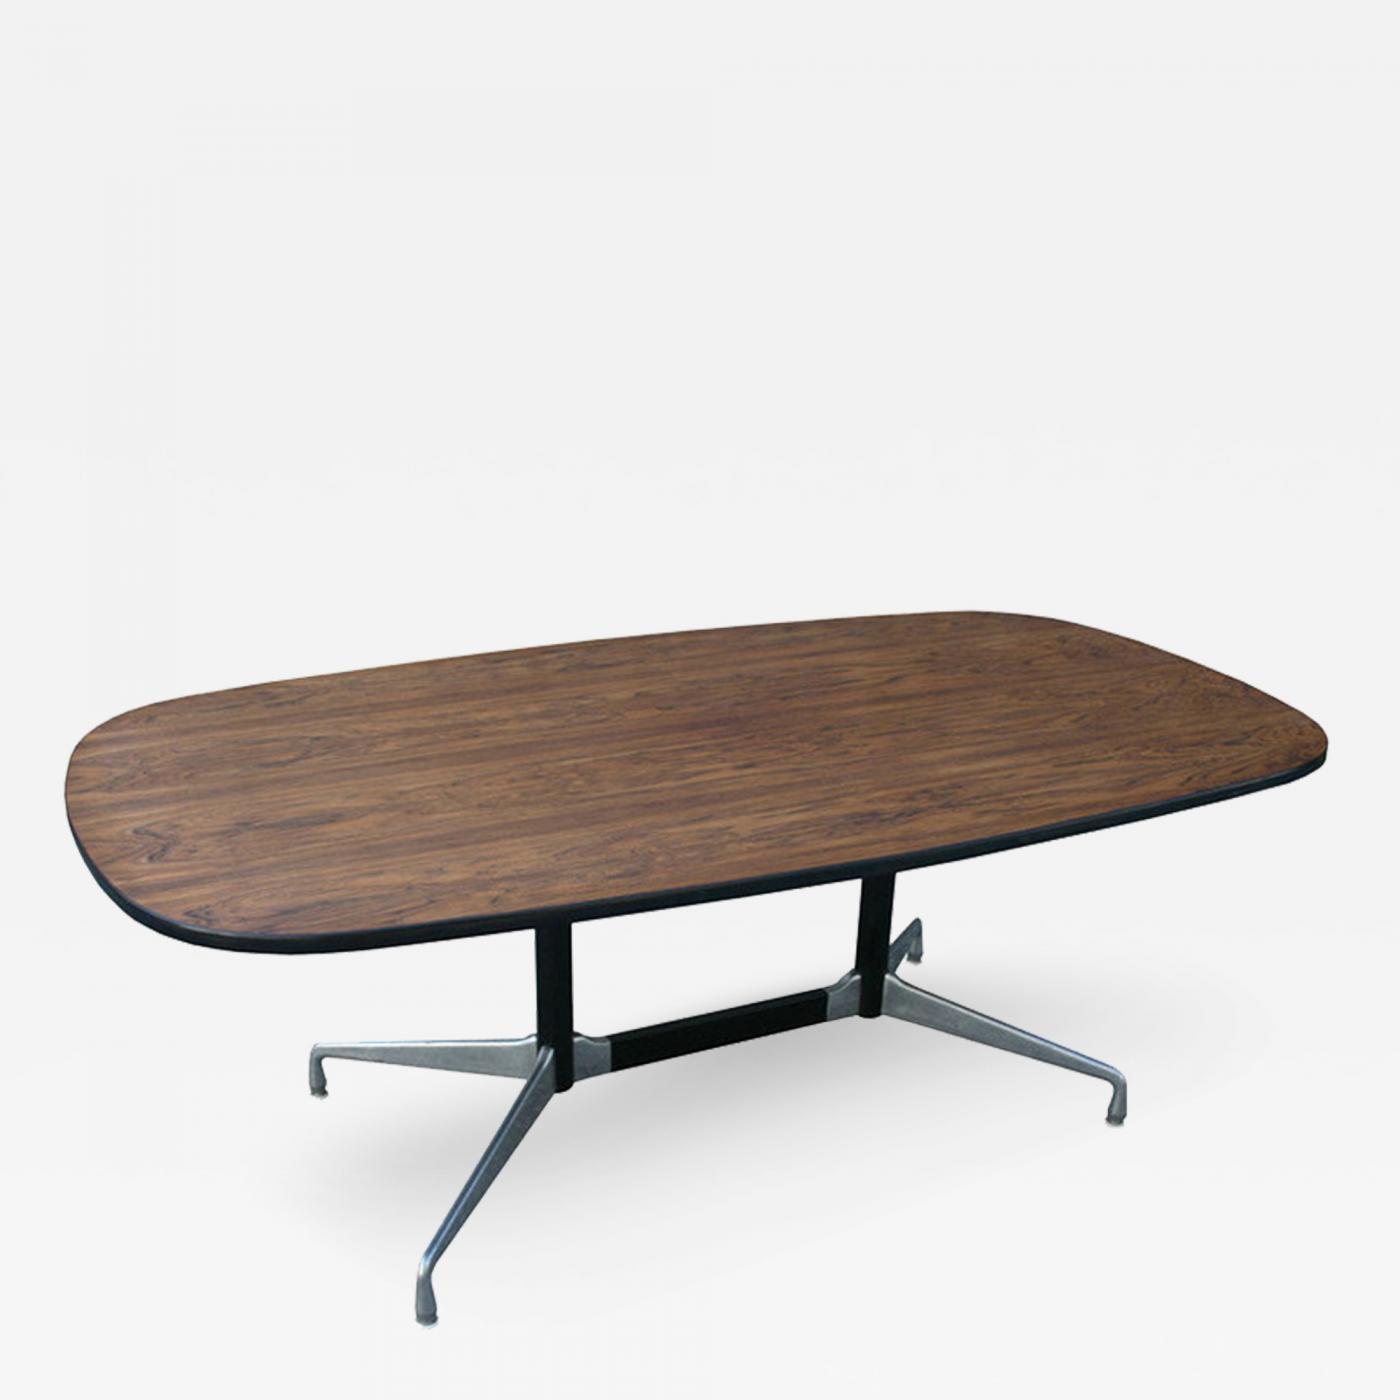 charles eames eames aluminum group table. Black Bedroom Furniture Sets. Home Design Ideas